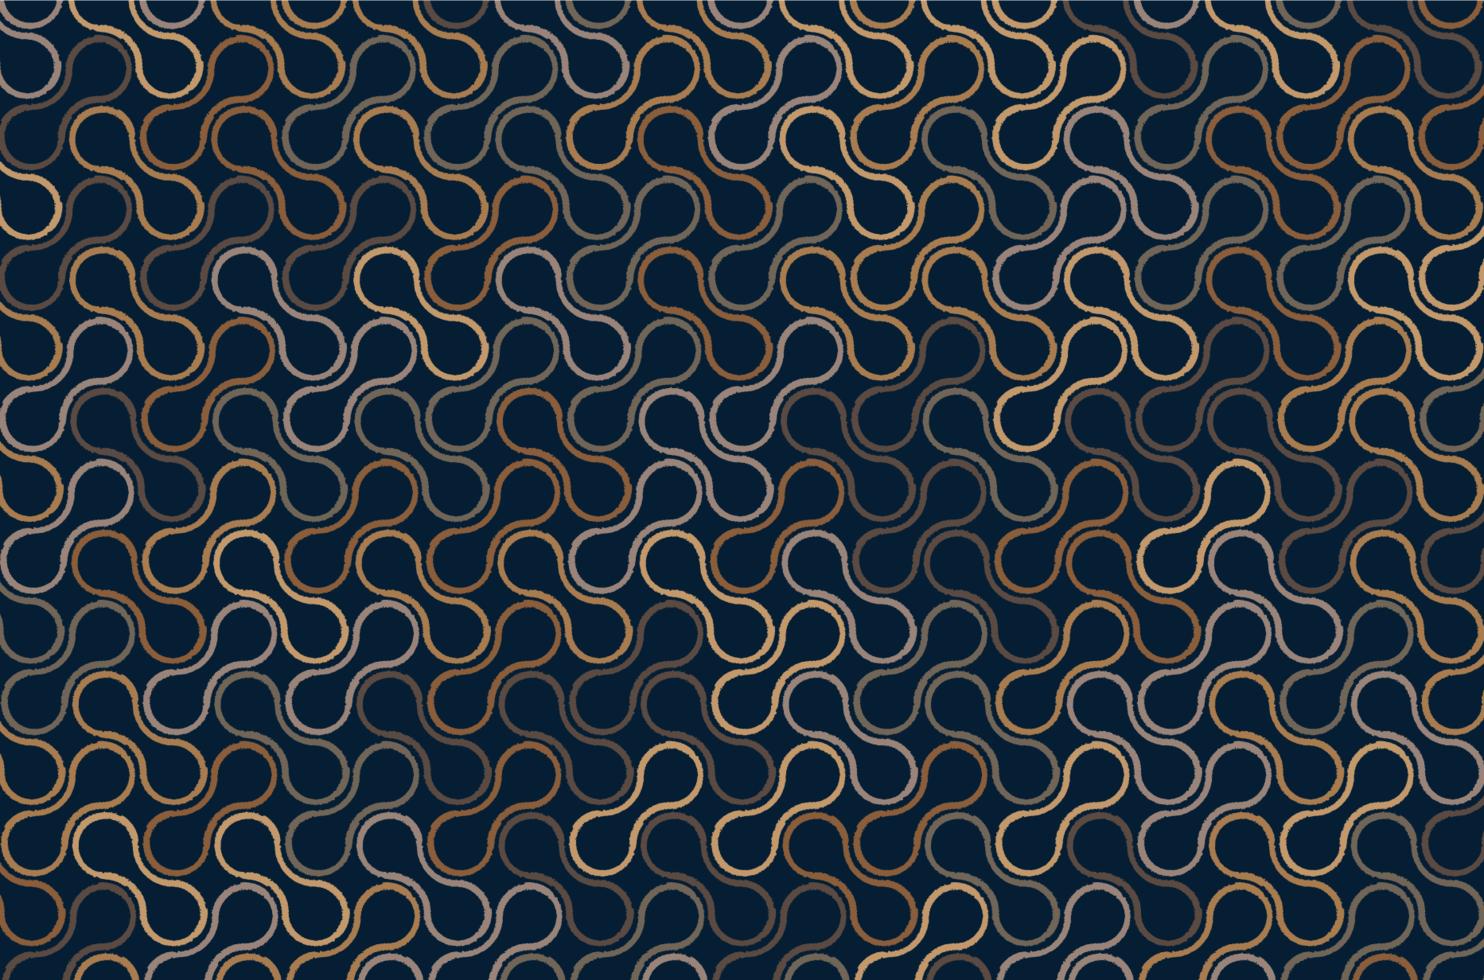 Metaballs Brown Outline Pattern vector